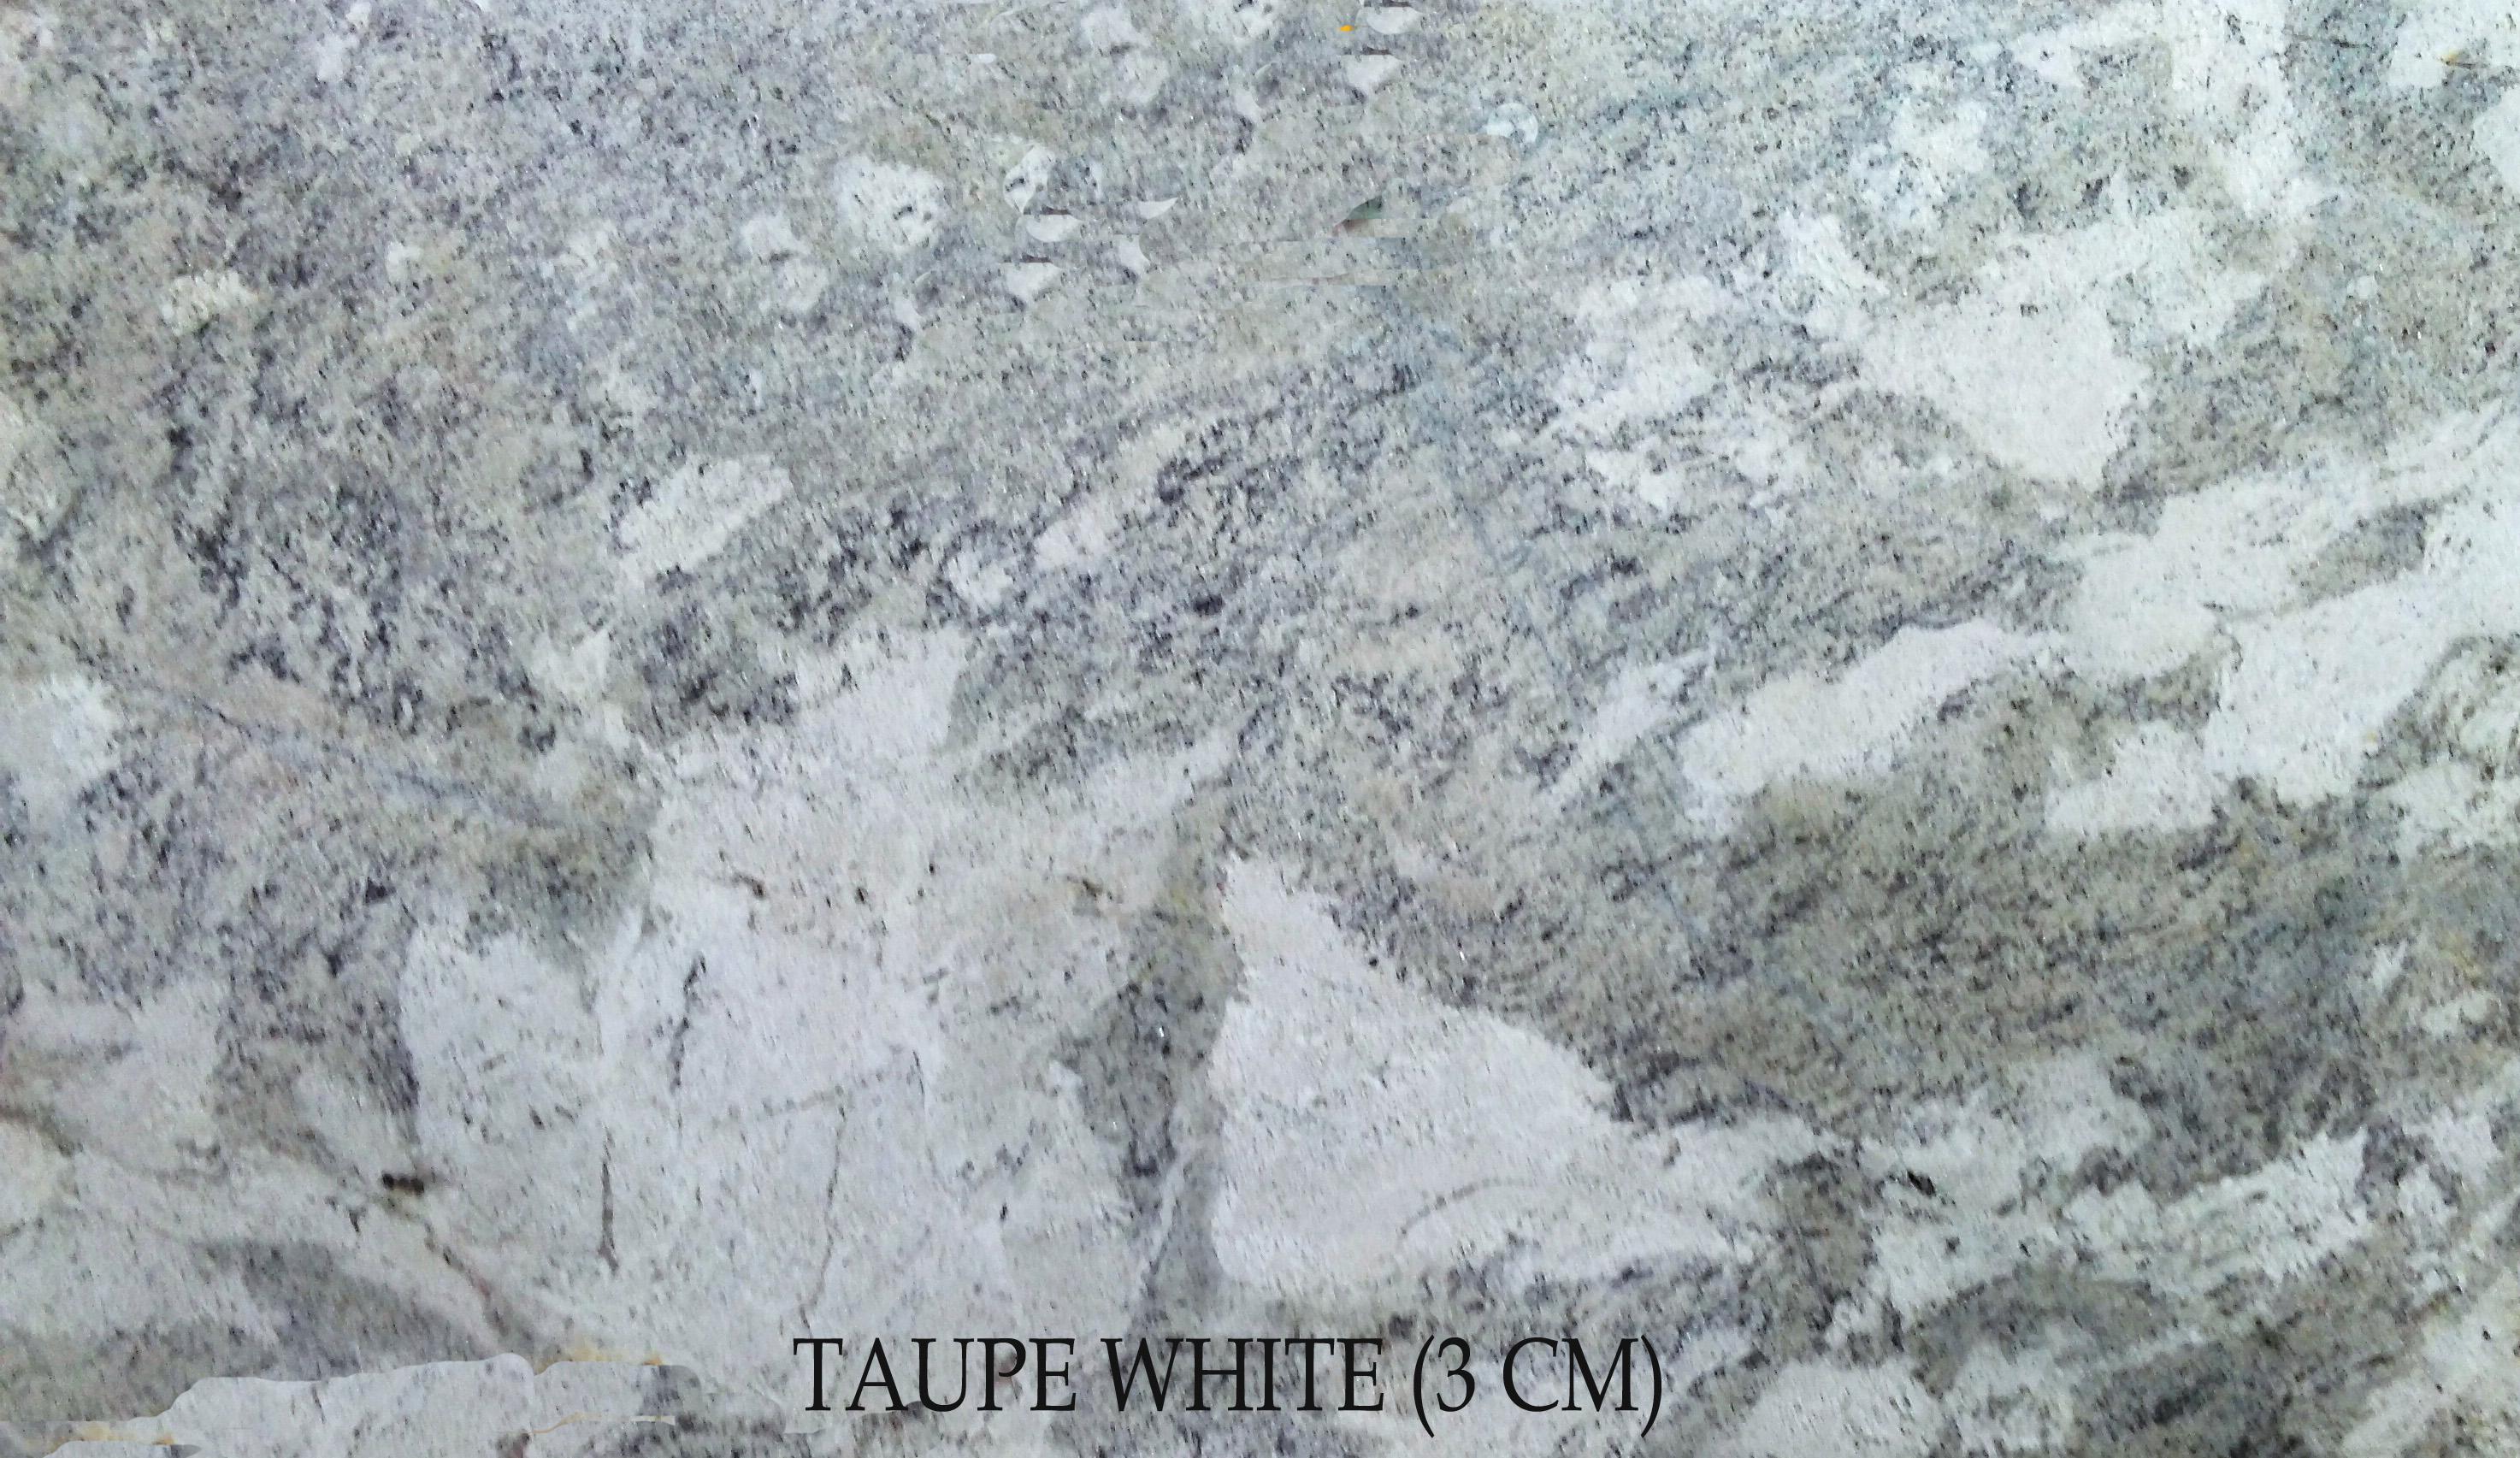 TAUPE WHITE (3 CM)